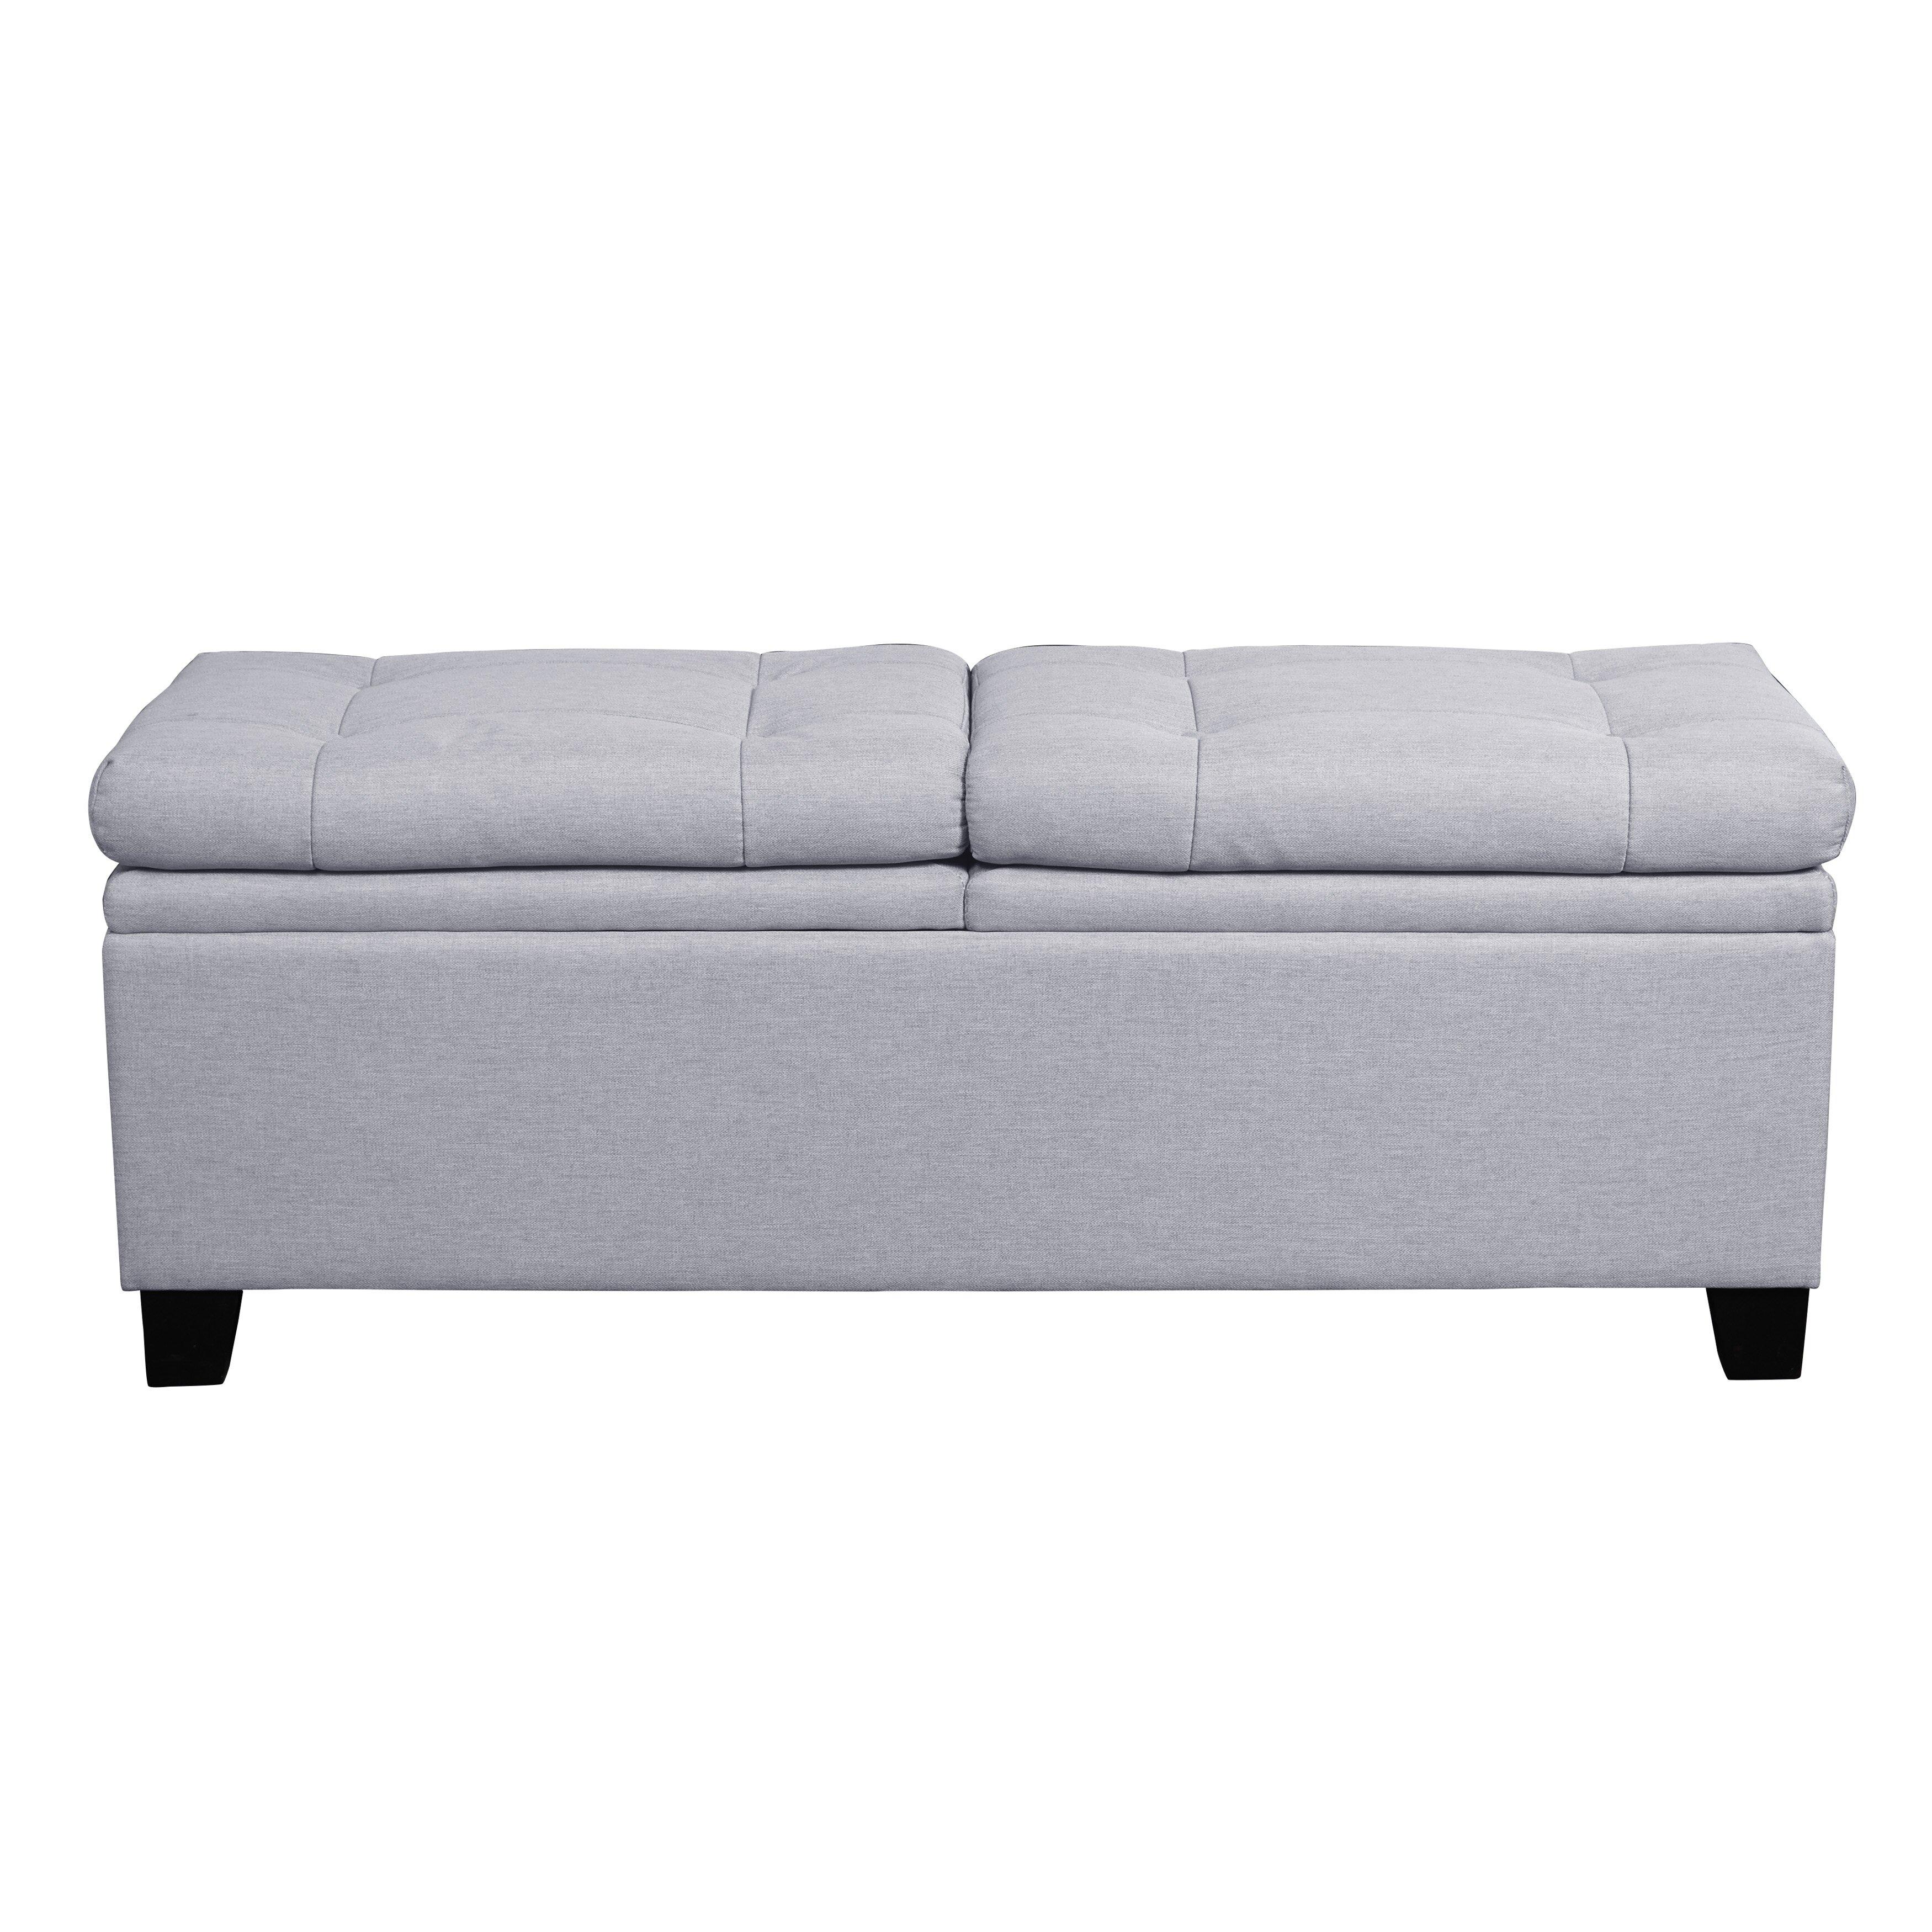 Pri Lilac Fields Upholstered Bedroom Storage Bench Reviews Wayfair